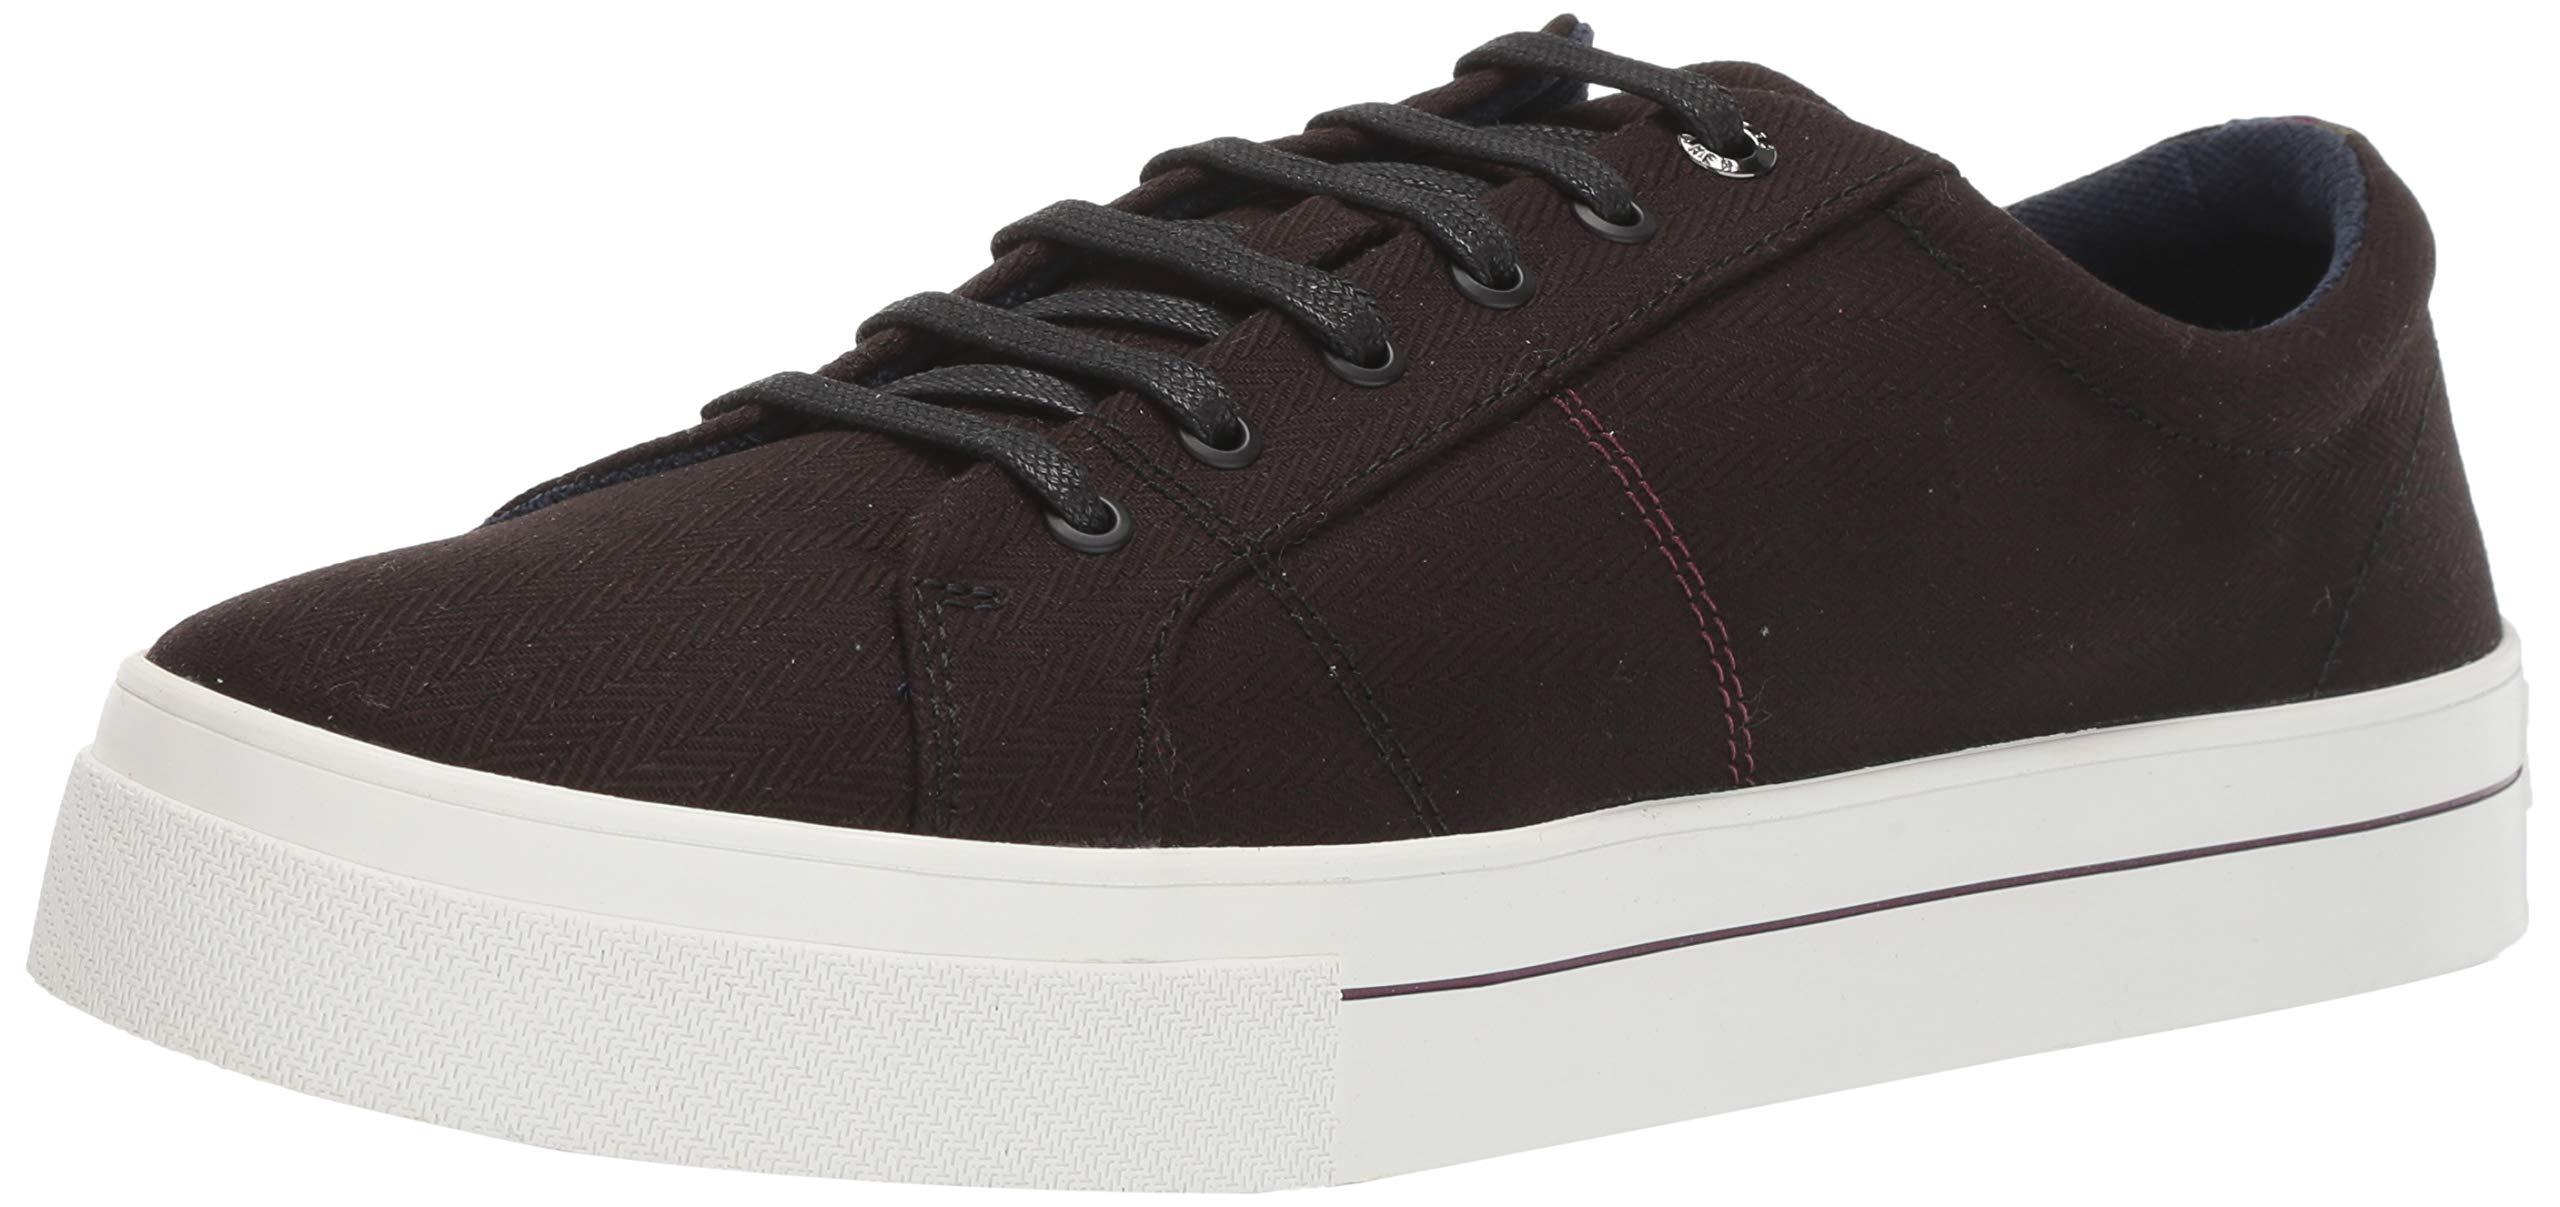 Ted Baker Men/'s Surlif Black Sneakers Shoes